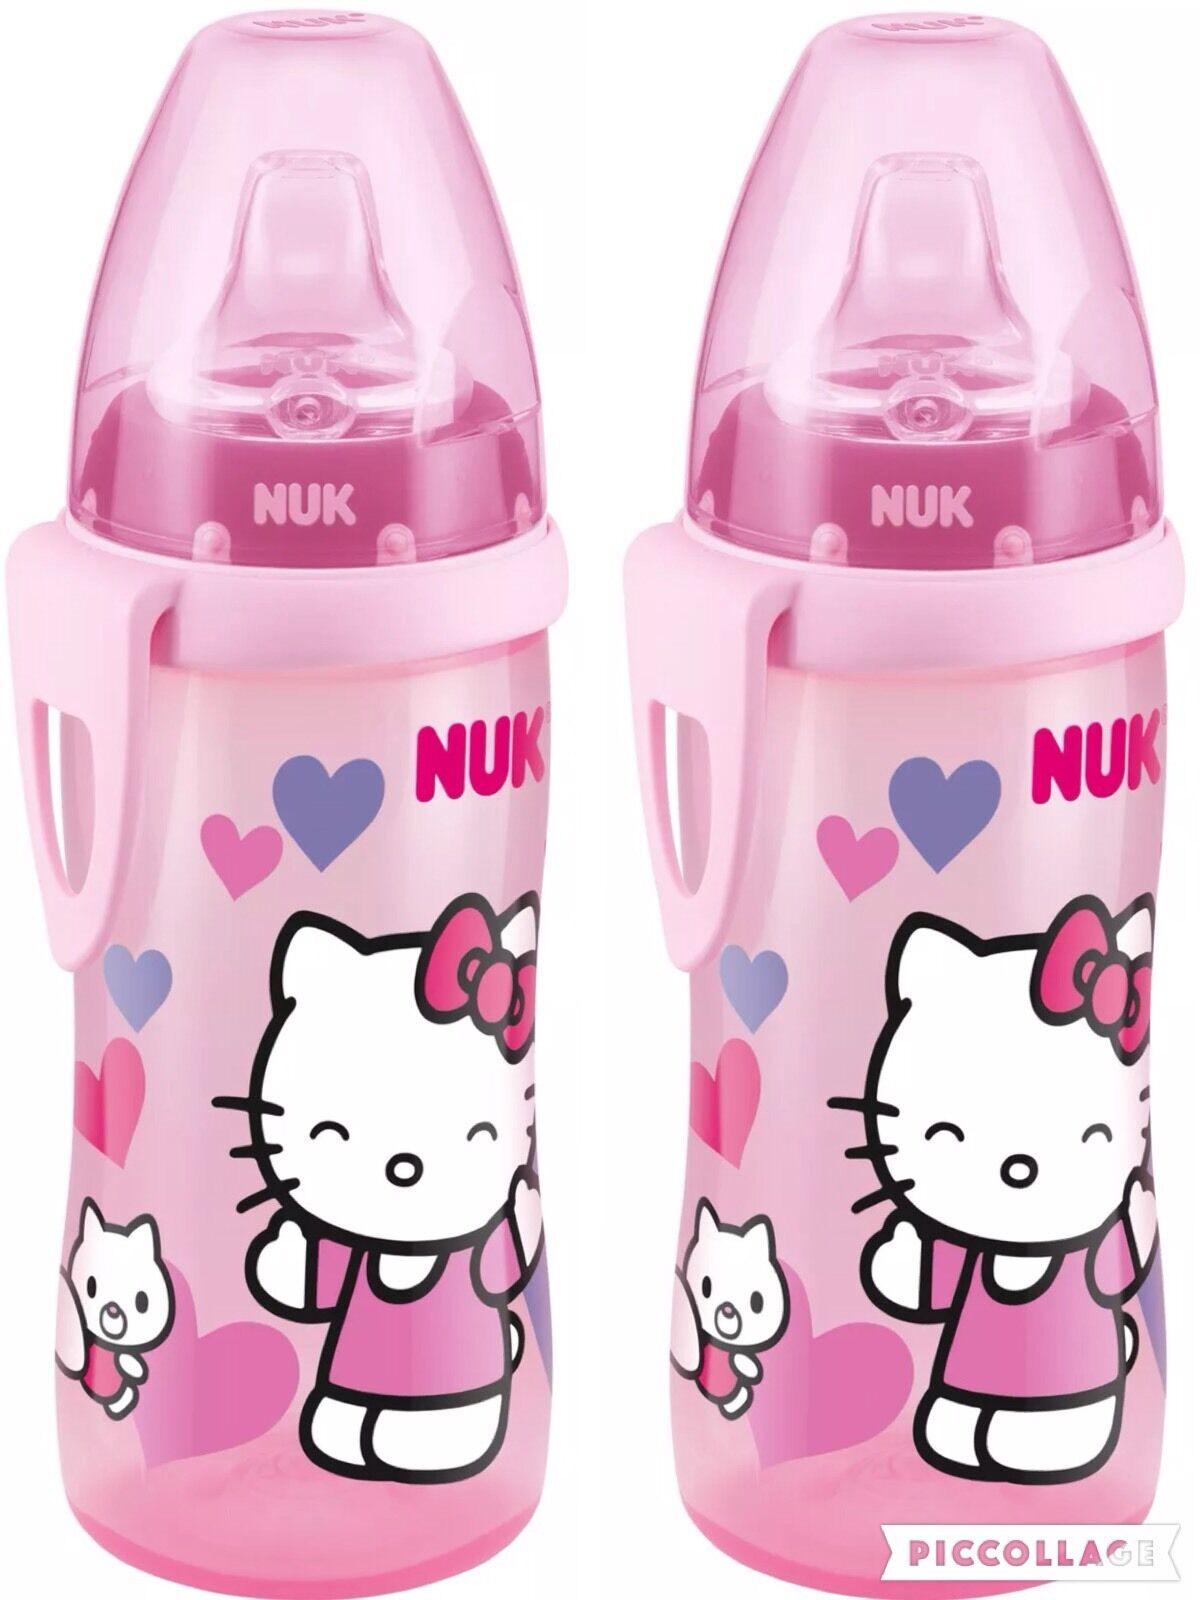 NUK Hello Kitty Active Cup 300 ml, ab 12 Monate, 2er Set neu &ovp